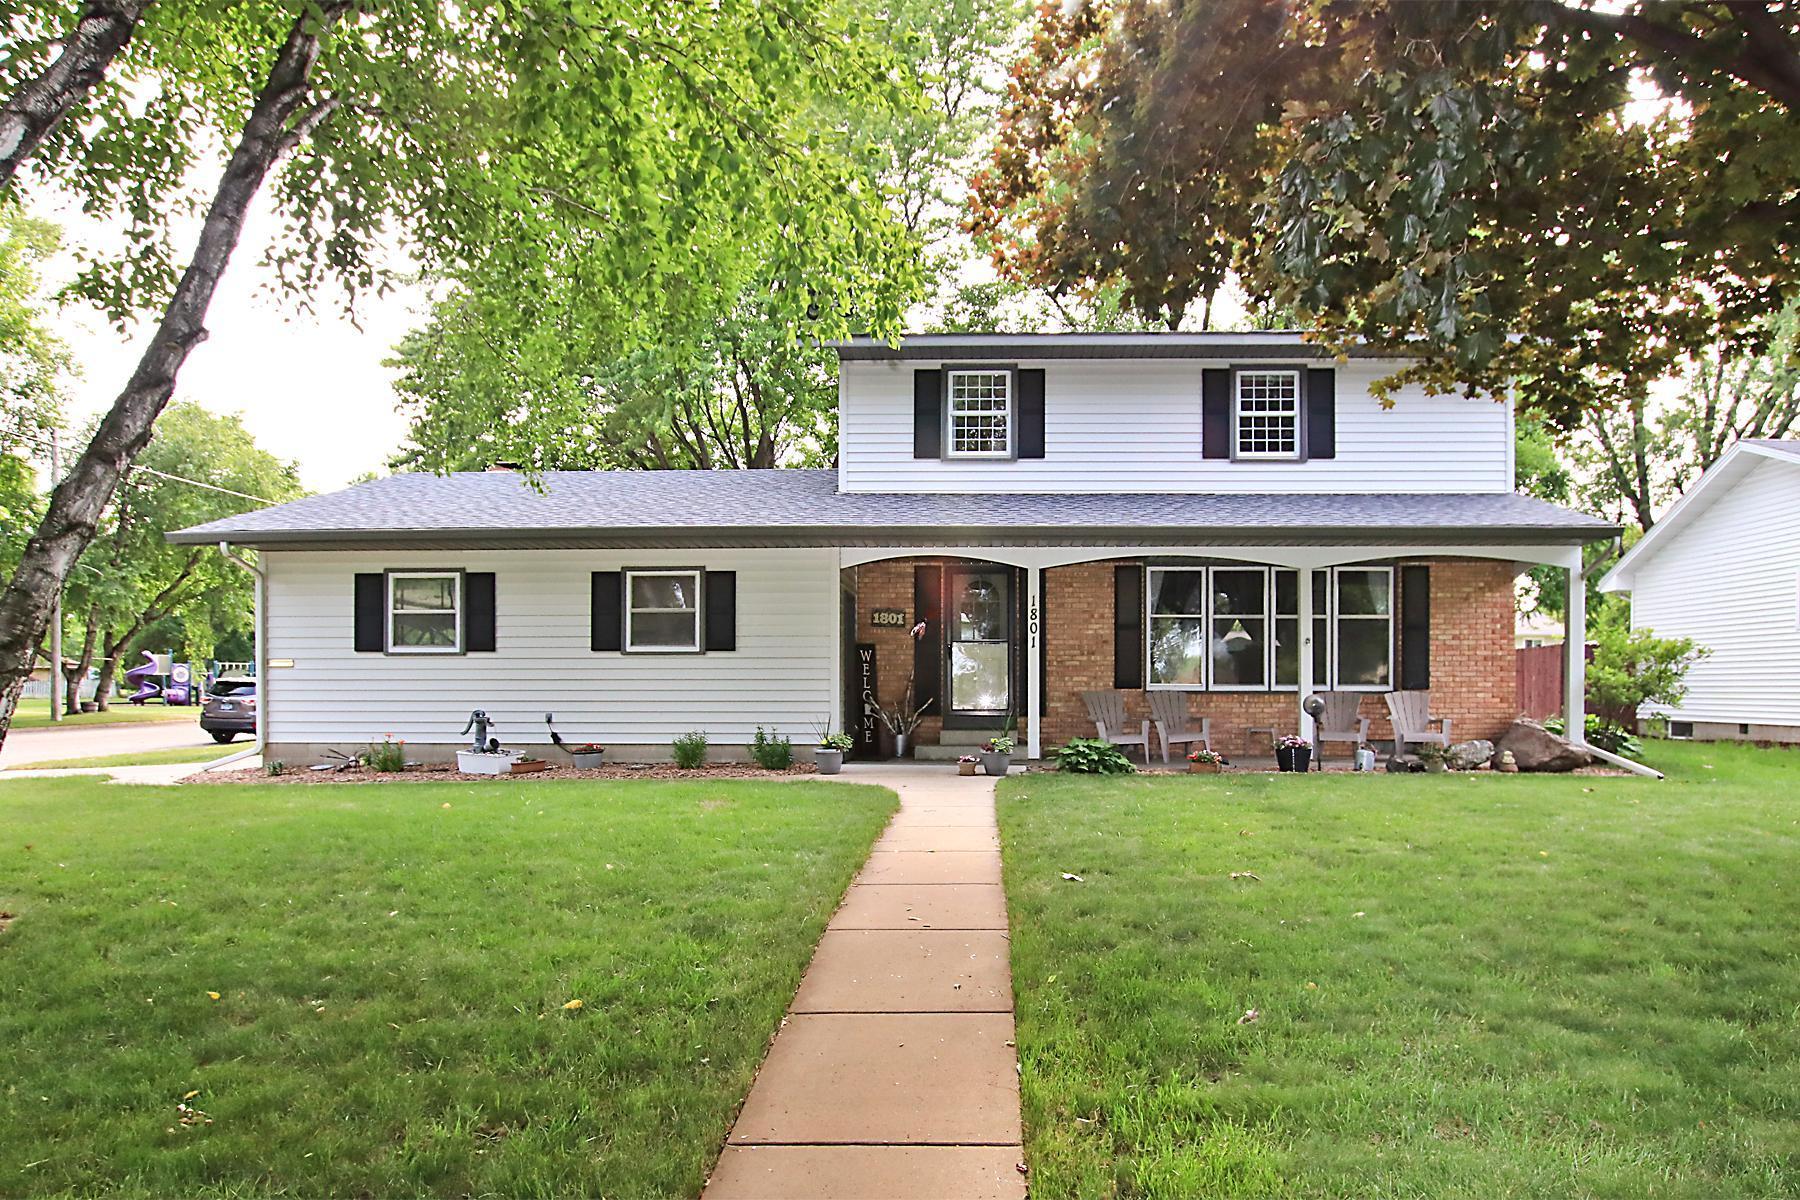 1801 Knight N Property Photo - Glencoe, MN real estate listing